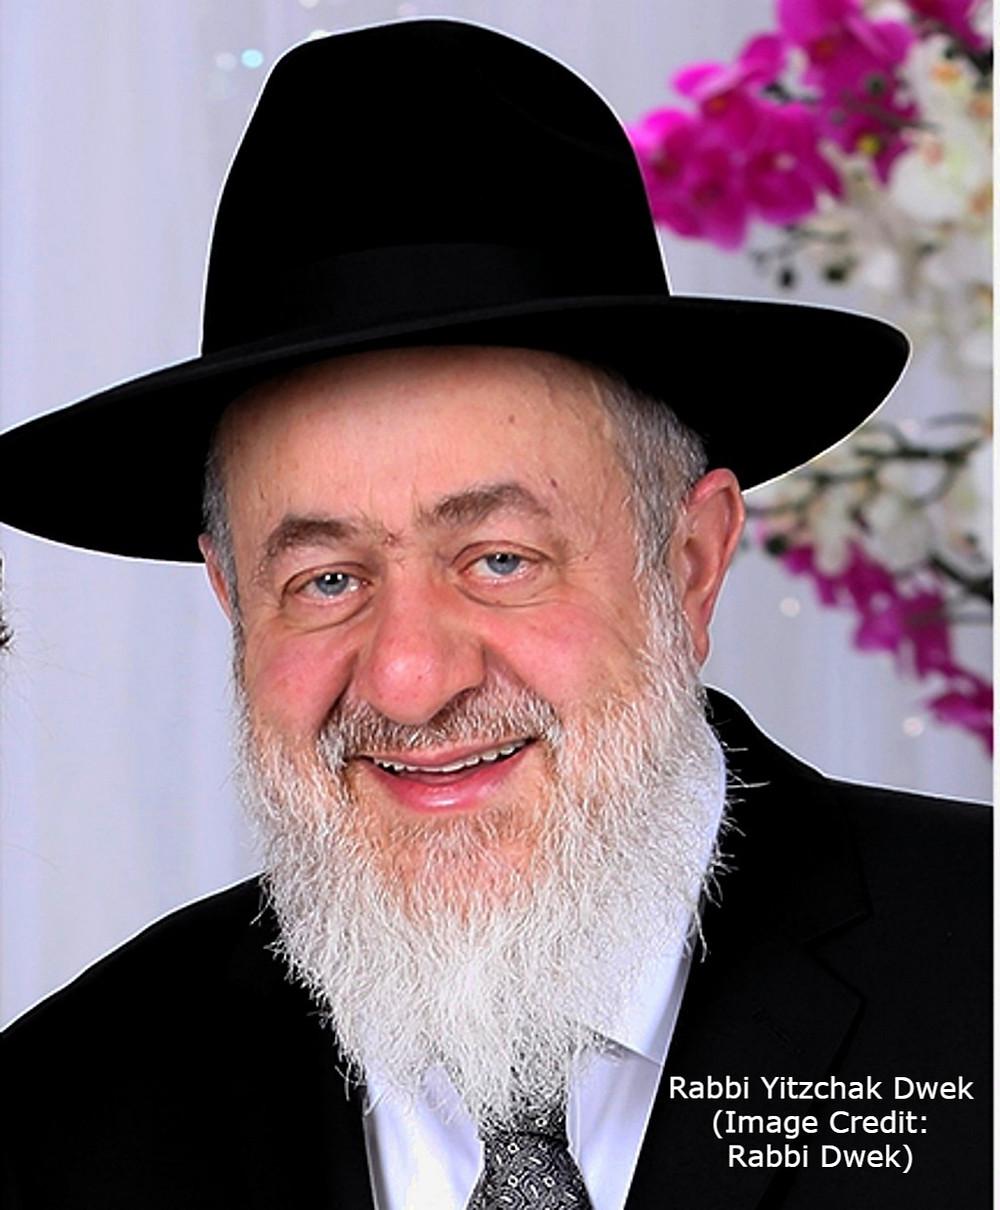 Rabbi Yitzchak Dwek (Image Credit: Rabbi Dwek)